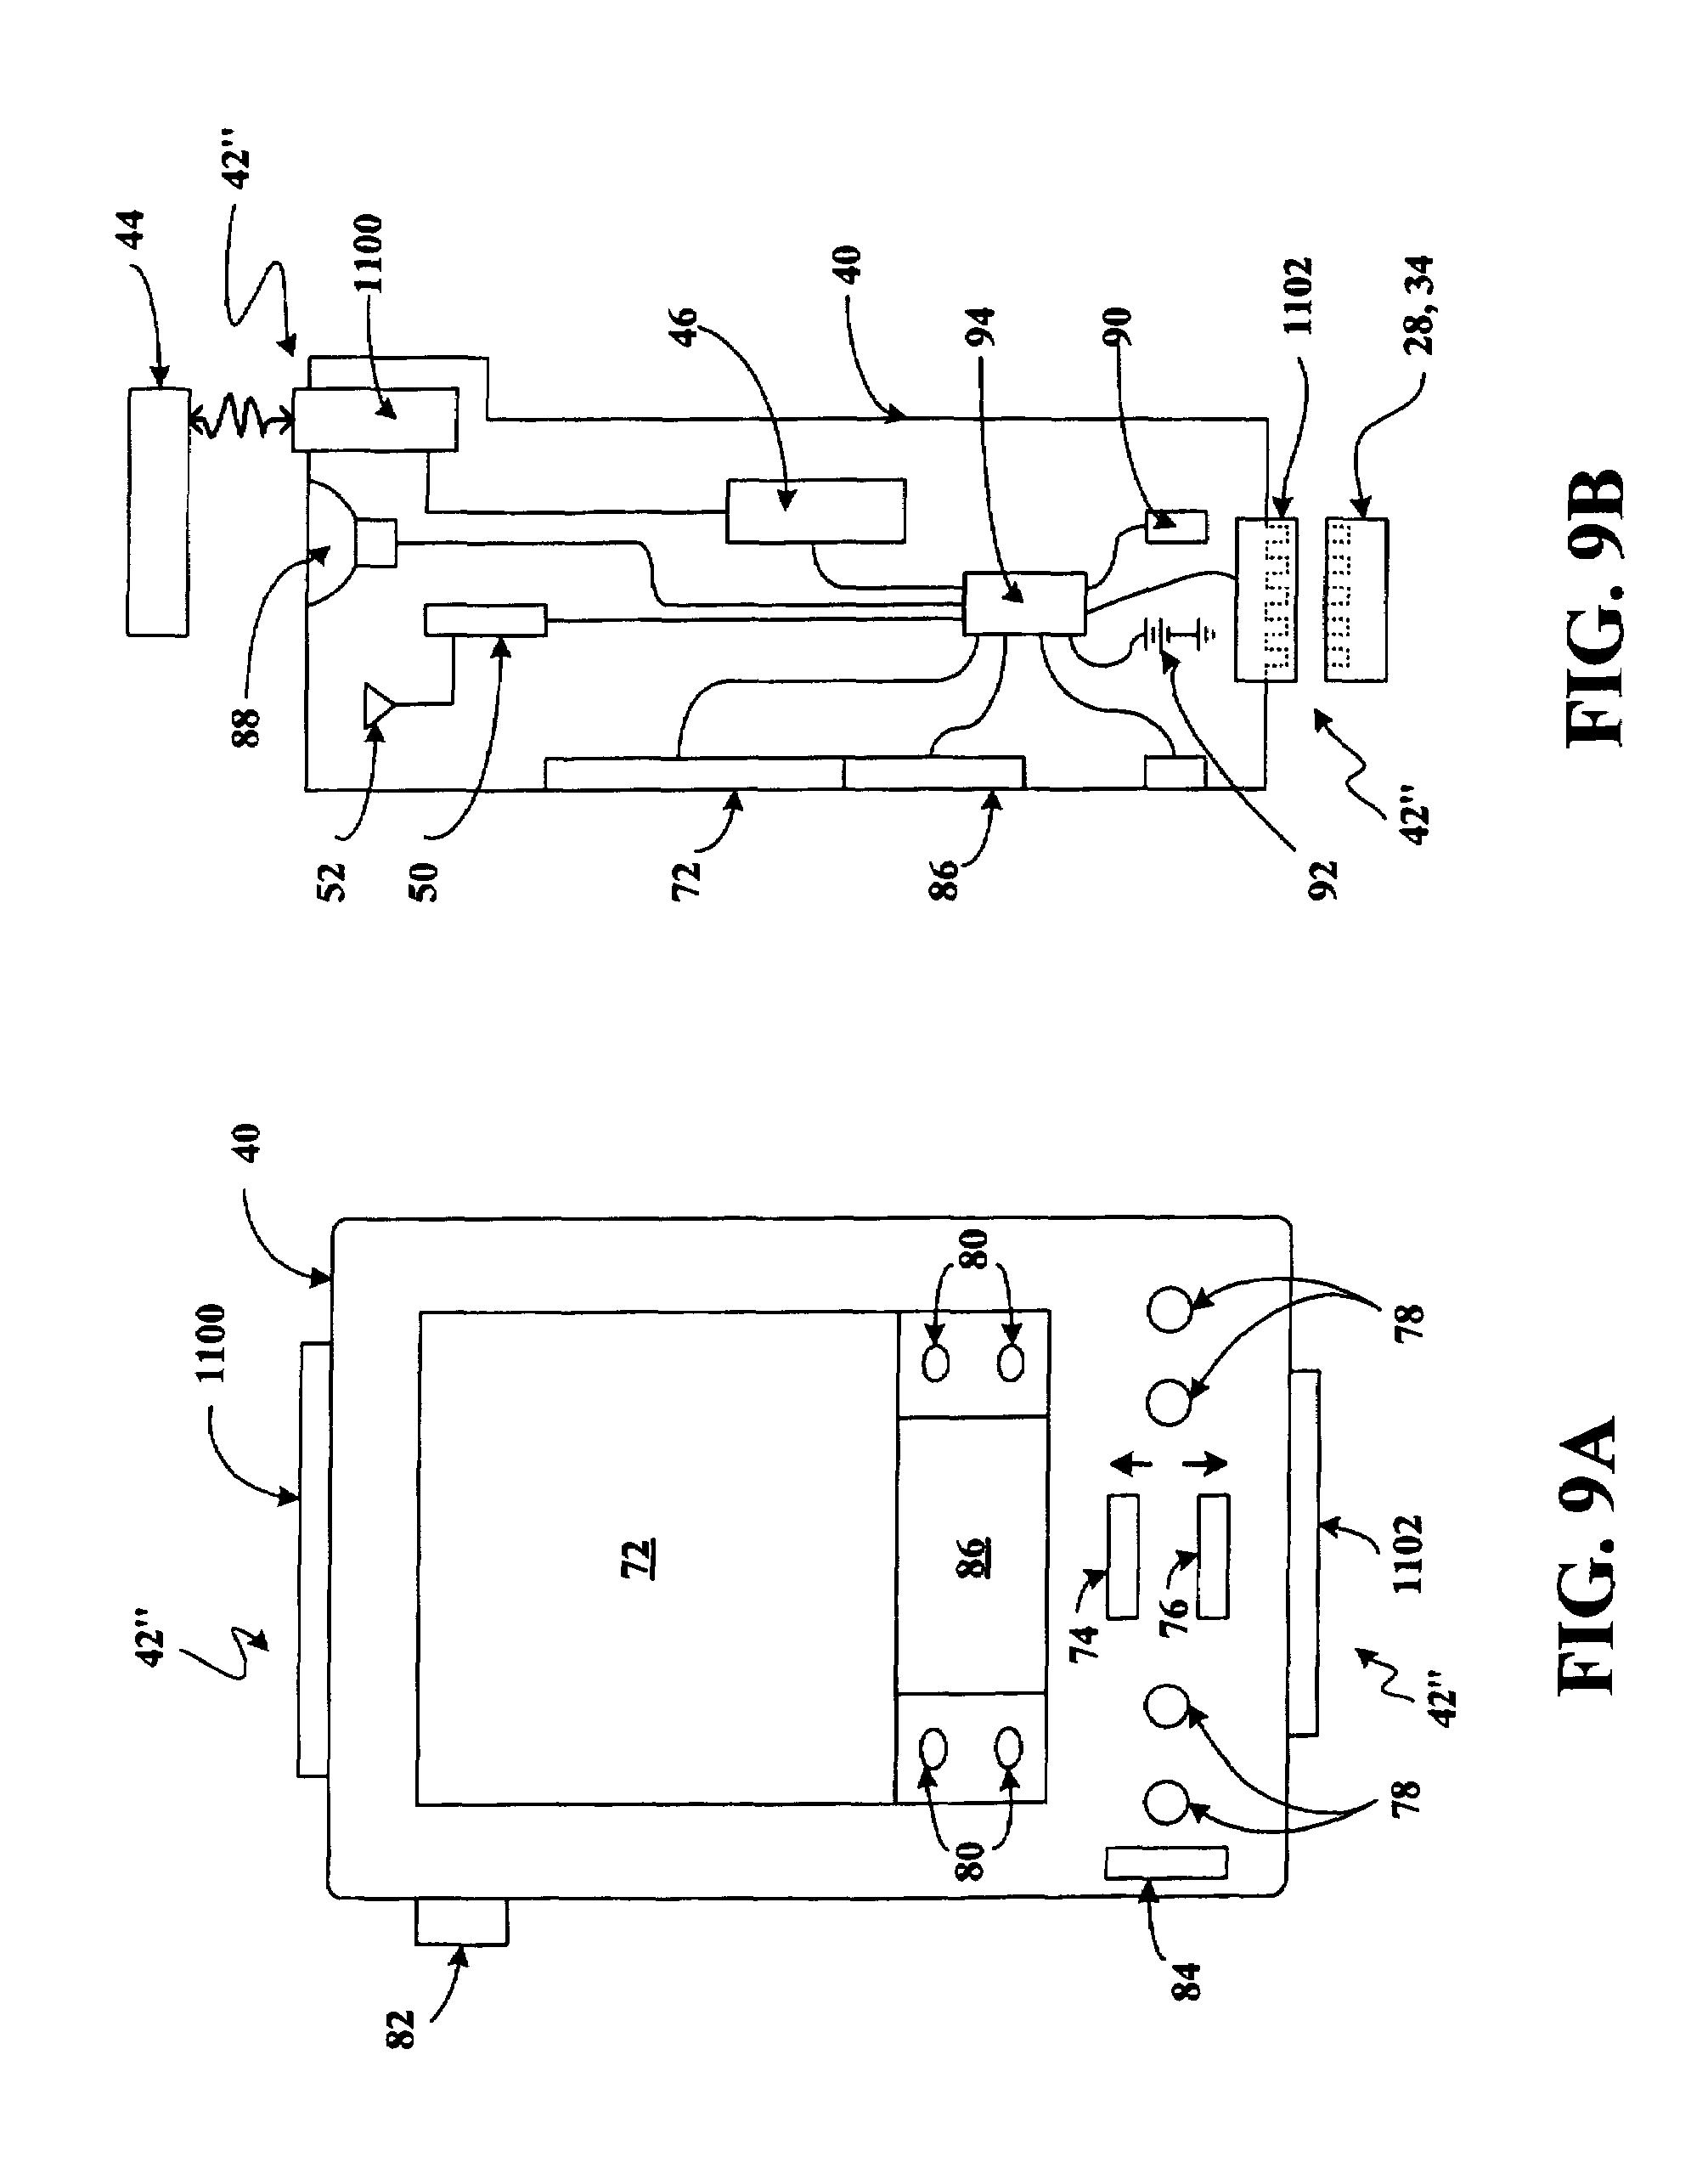 Patent Us 7010501 B1 Memo Board Flashing Light Circuit